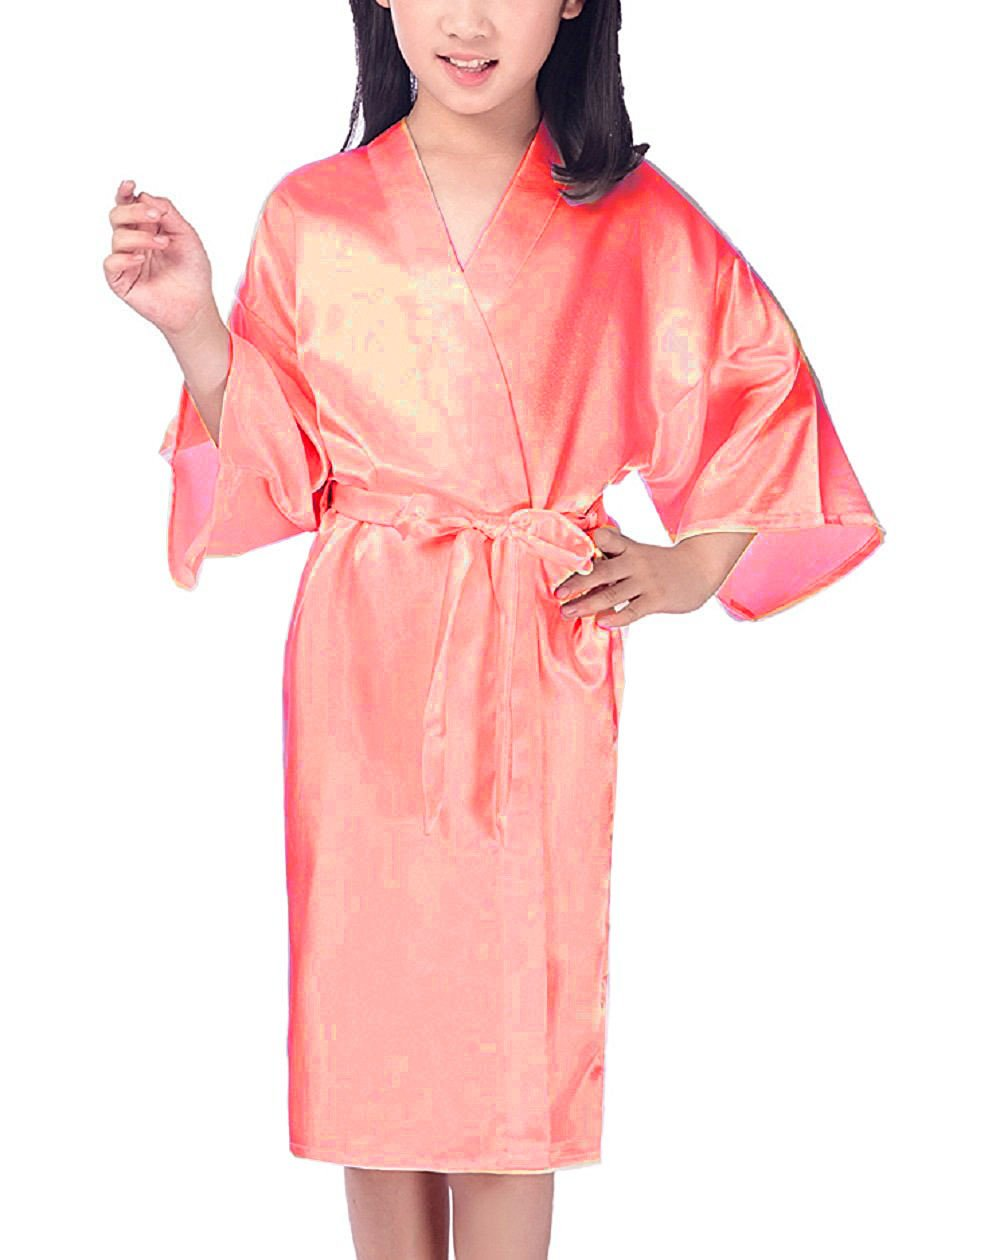 Mobarta Girls Kids' Satin Kimono Robe Fashion Bathrobe Silk Nightgown Getting Ready Robe for Wedding Spa Party Birthday Gift (Watermelon Red, 12) by Mobarta